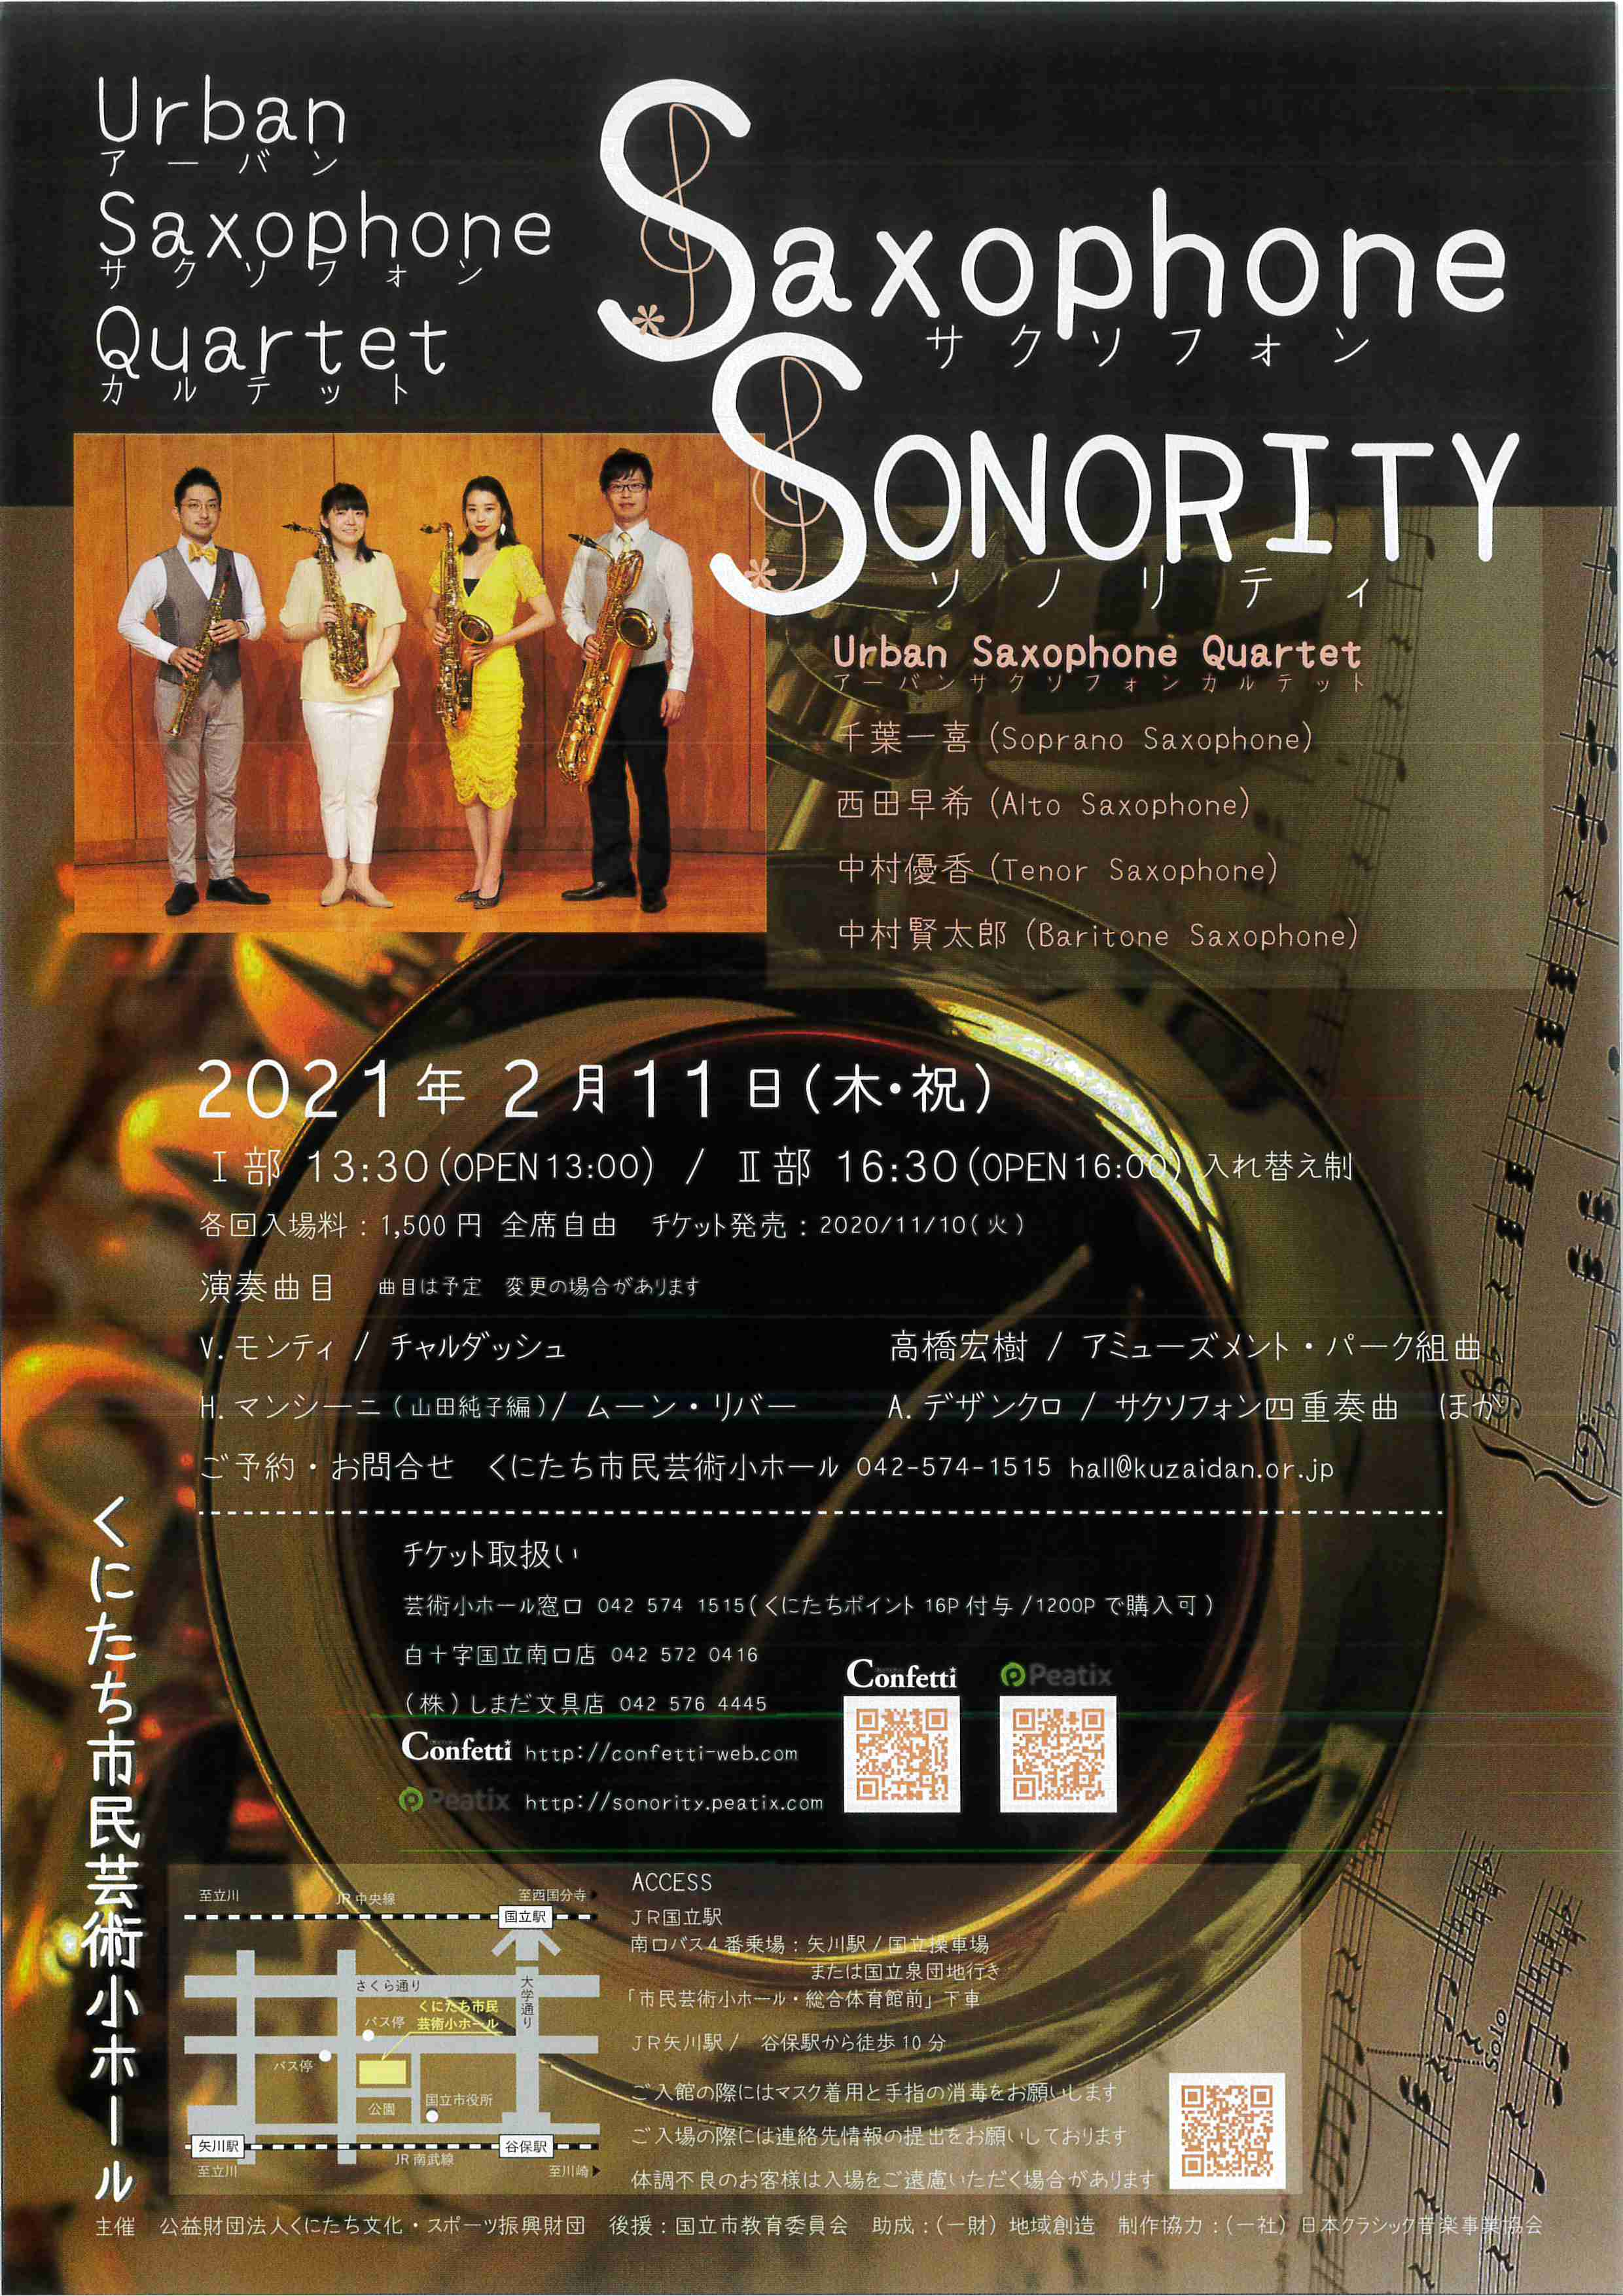 Urban Saxophone Quartet Saxophone SONORITY